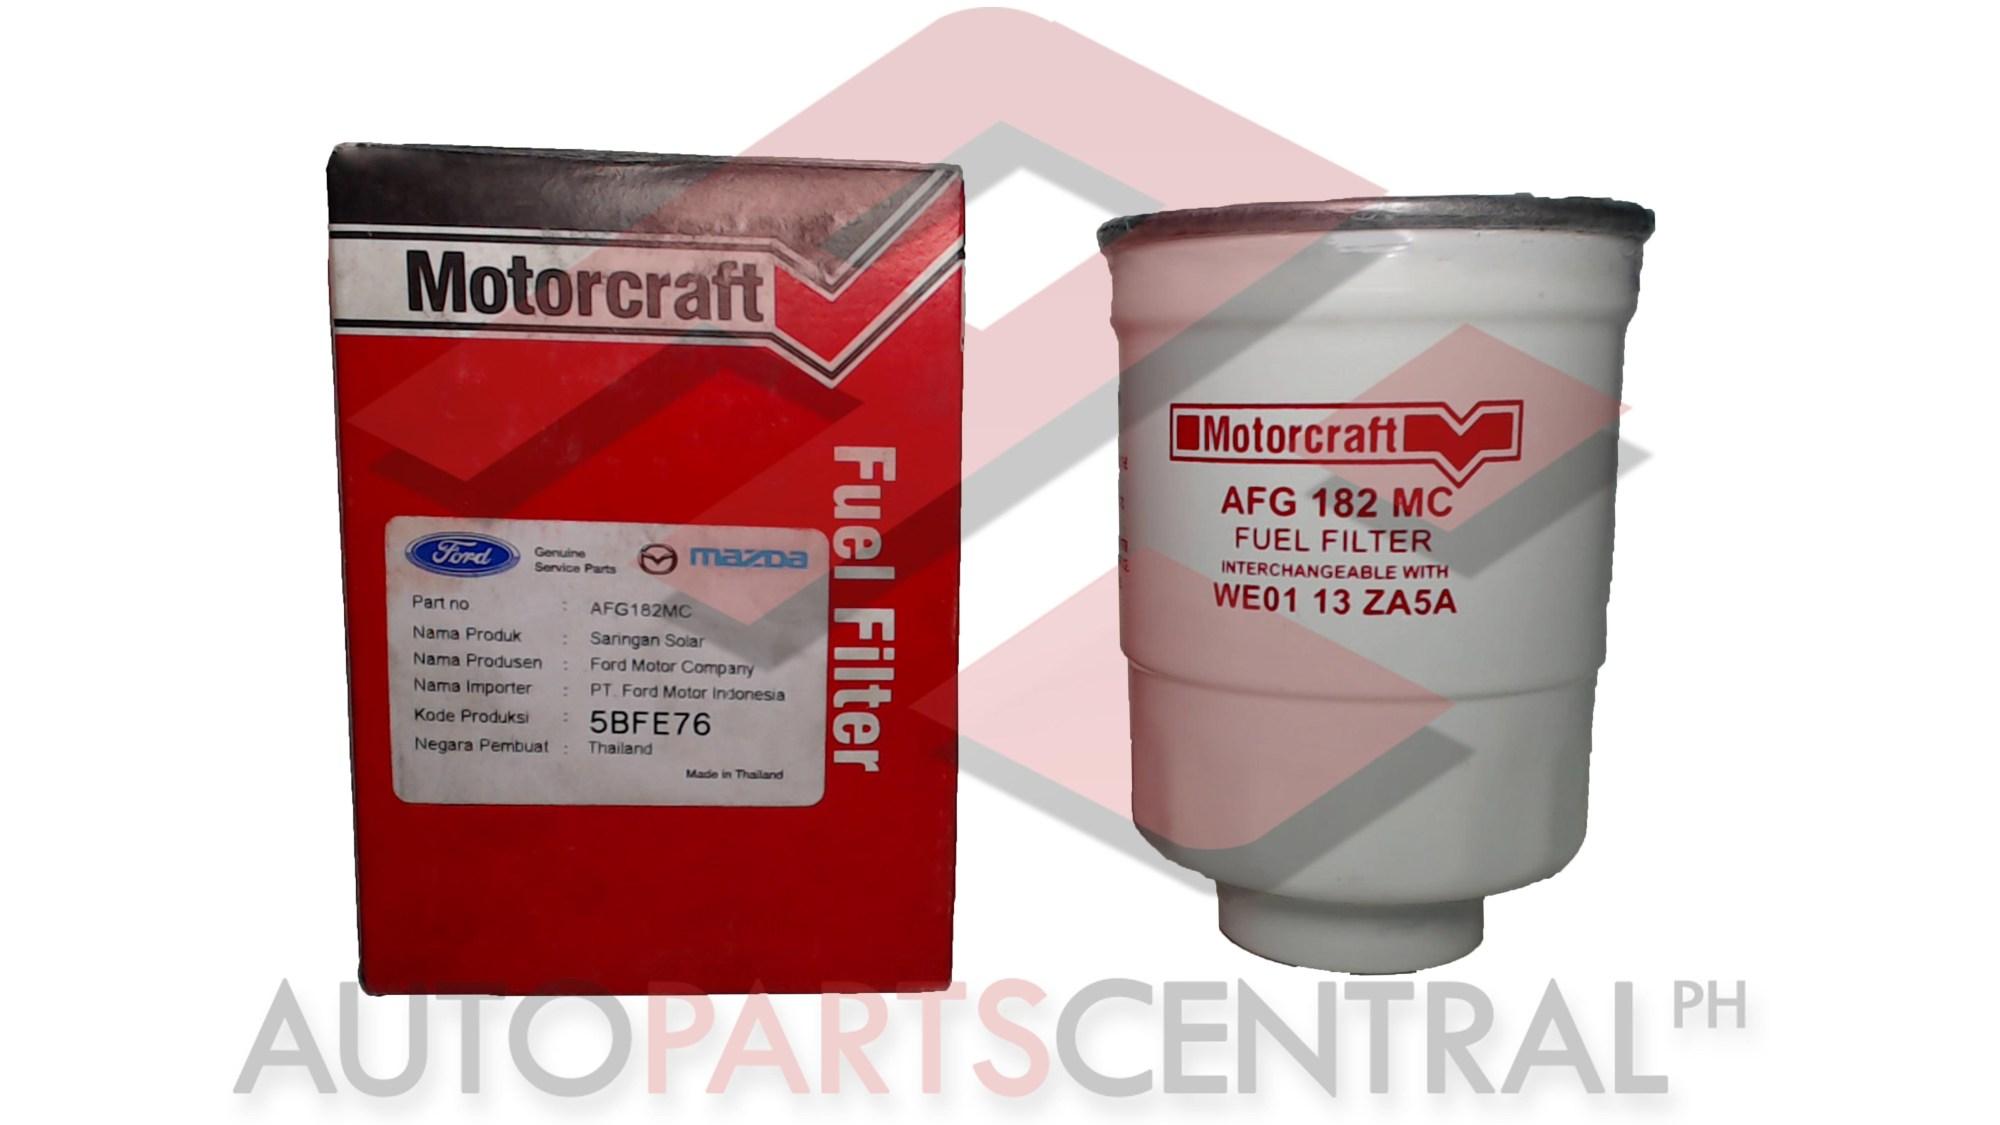 hight resolution of fuel filter motor craft afg 182mc ford everest